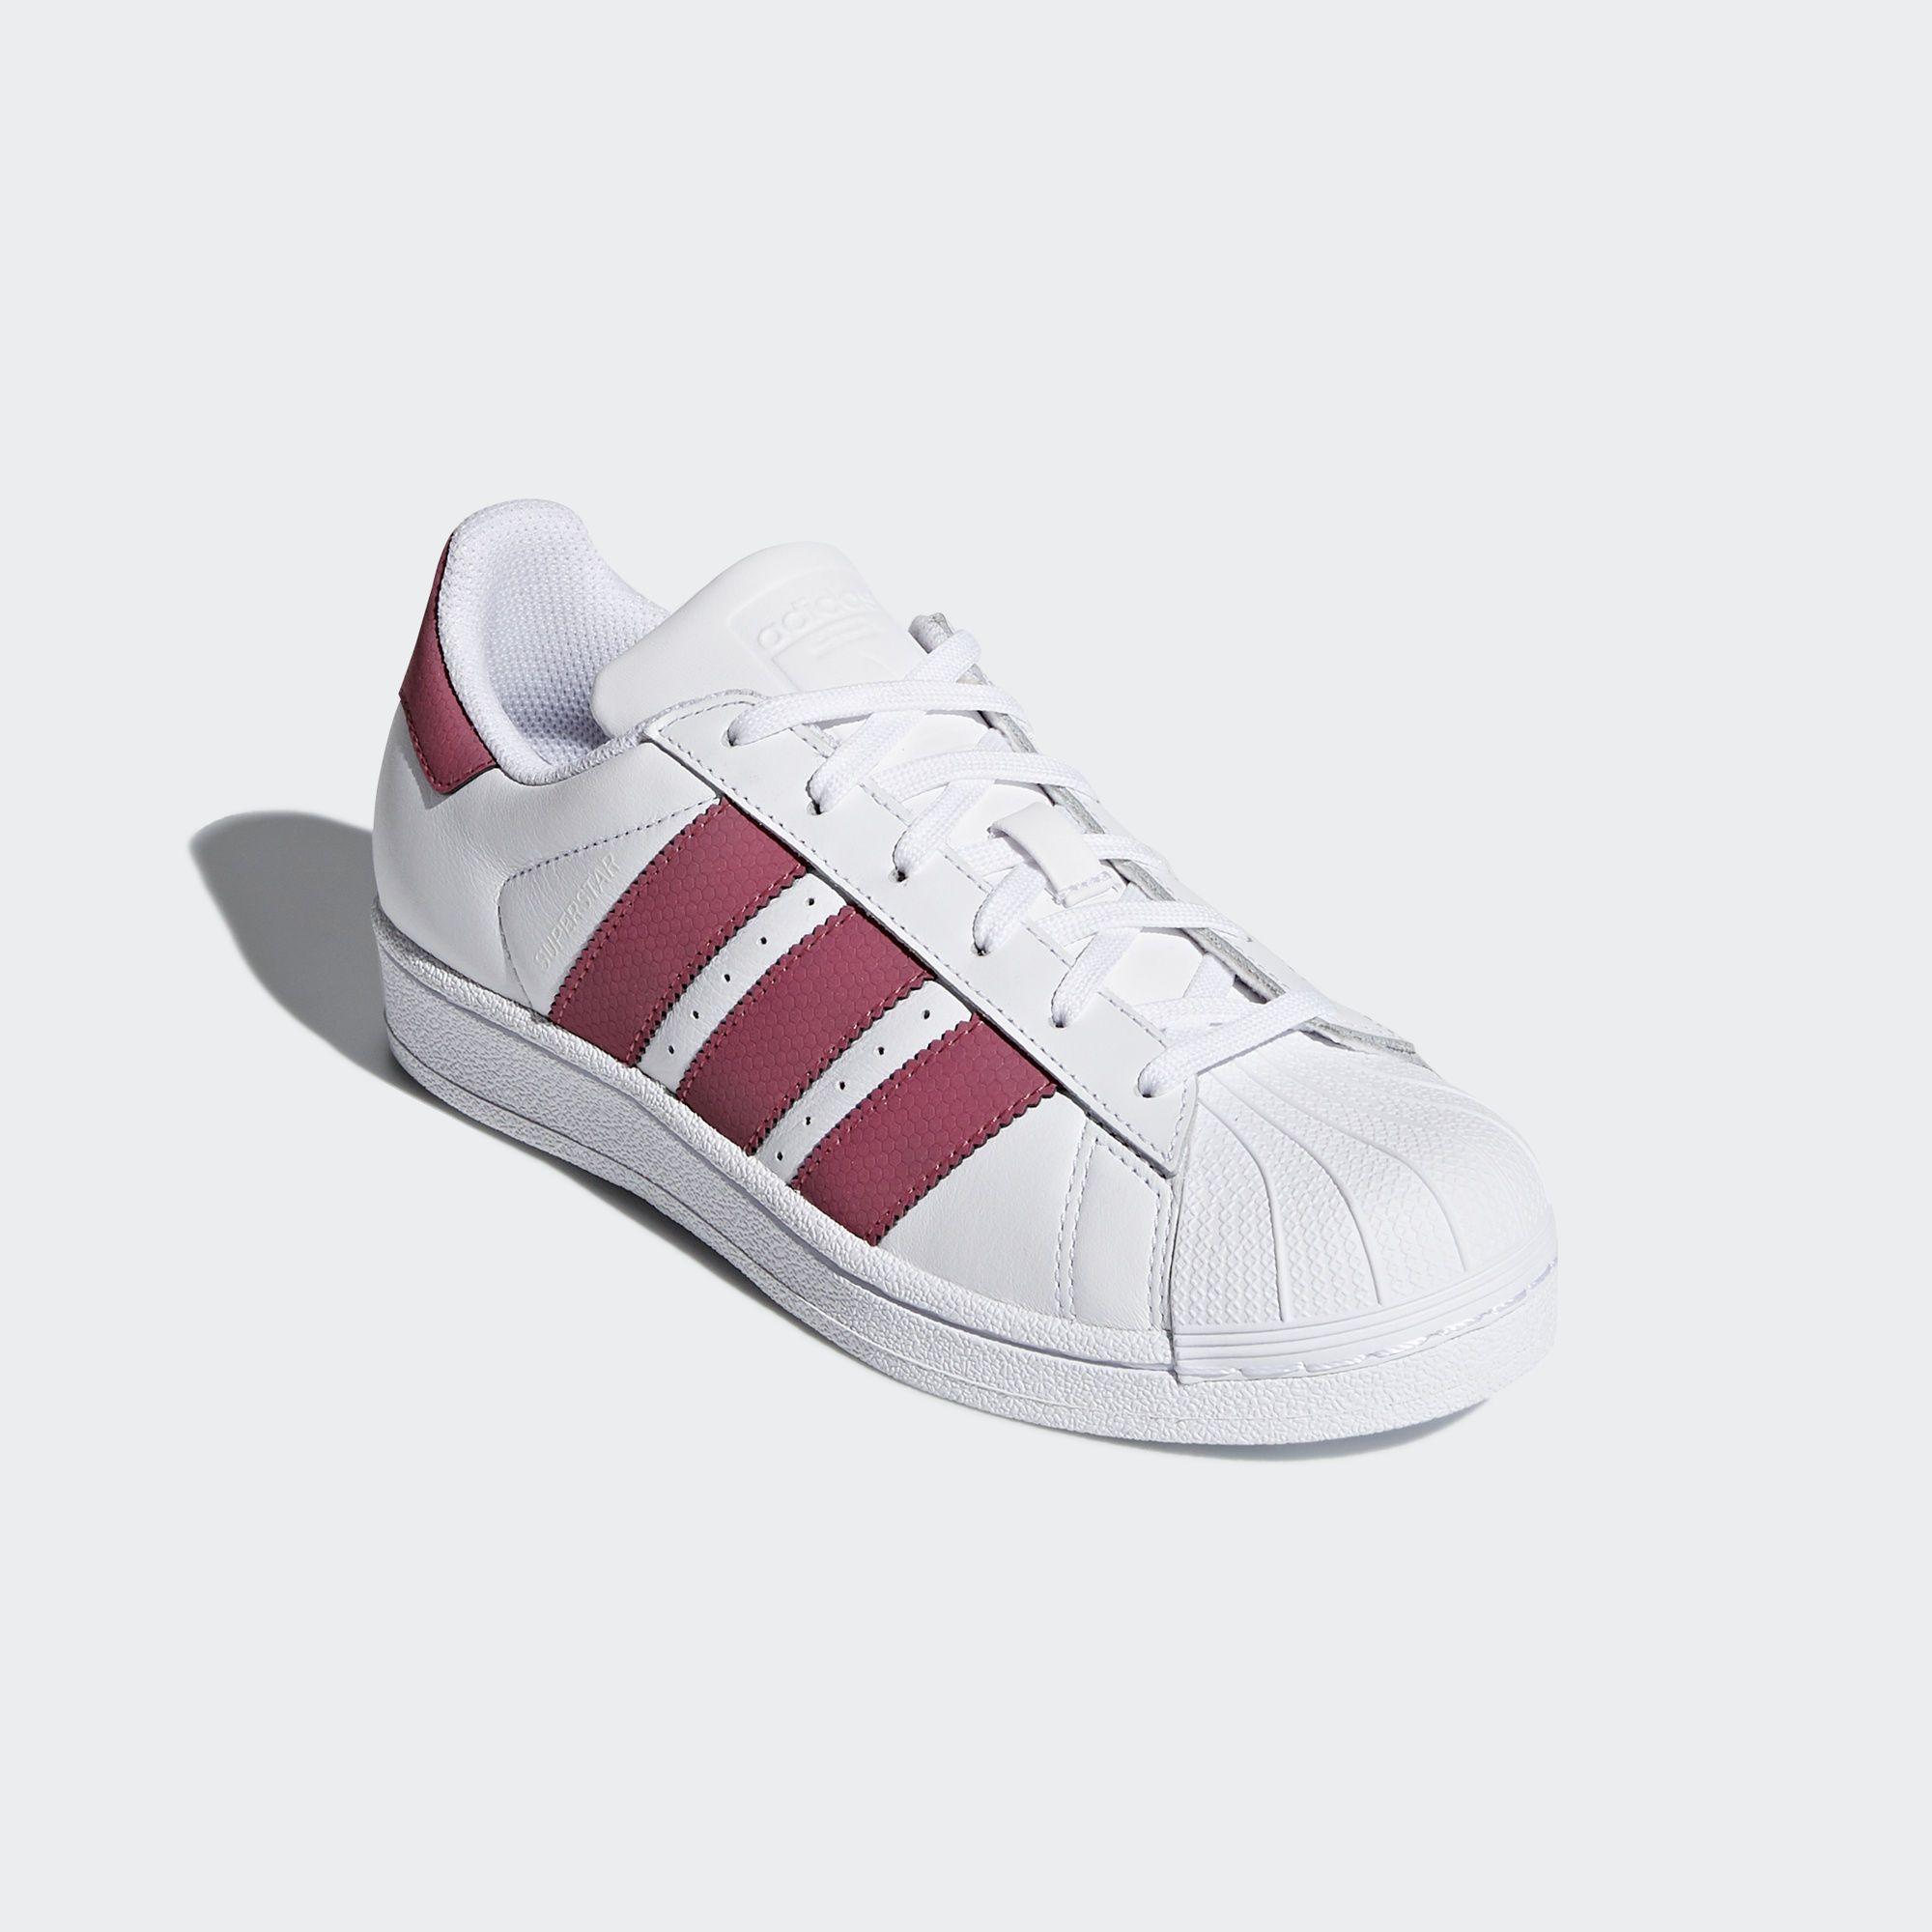 Adidas Buty dzieciece Superstar J biale r. 35.5 (CQ2690) CQ2690